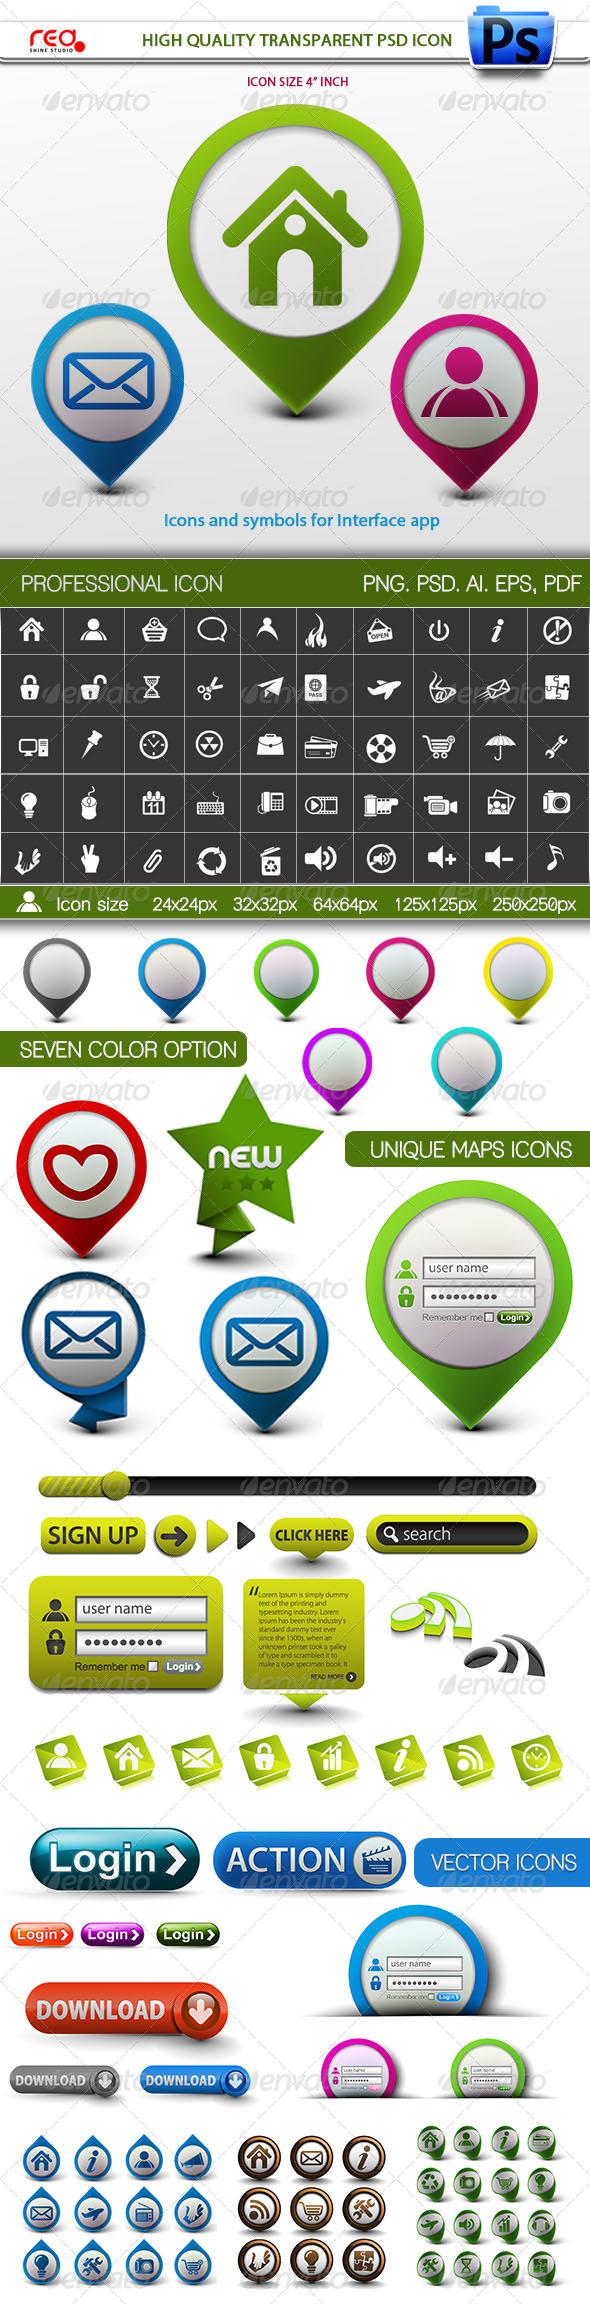 GraphicRiver Unique Maps Icons With Web Element 7907223